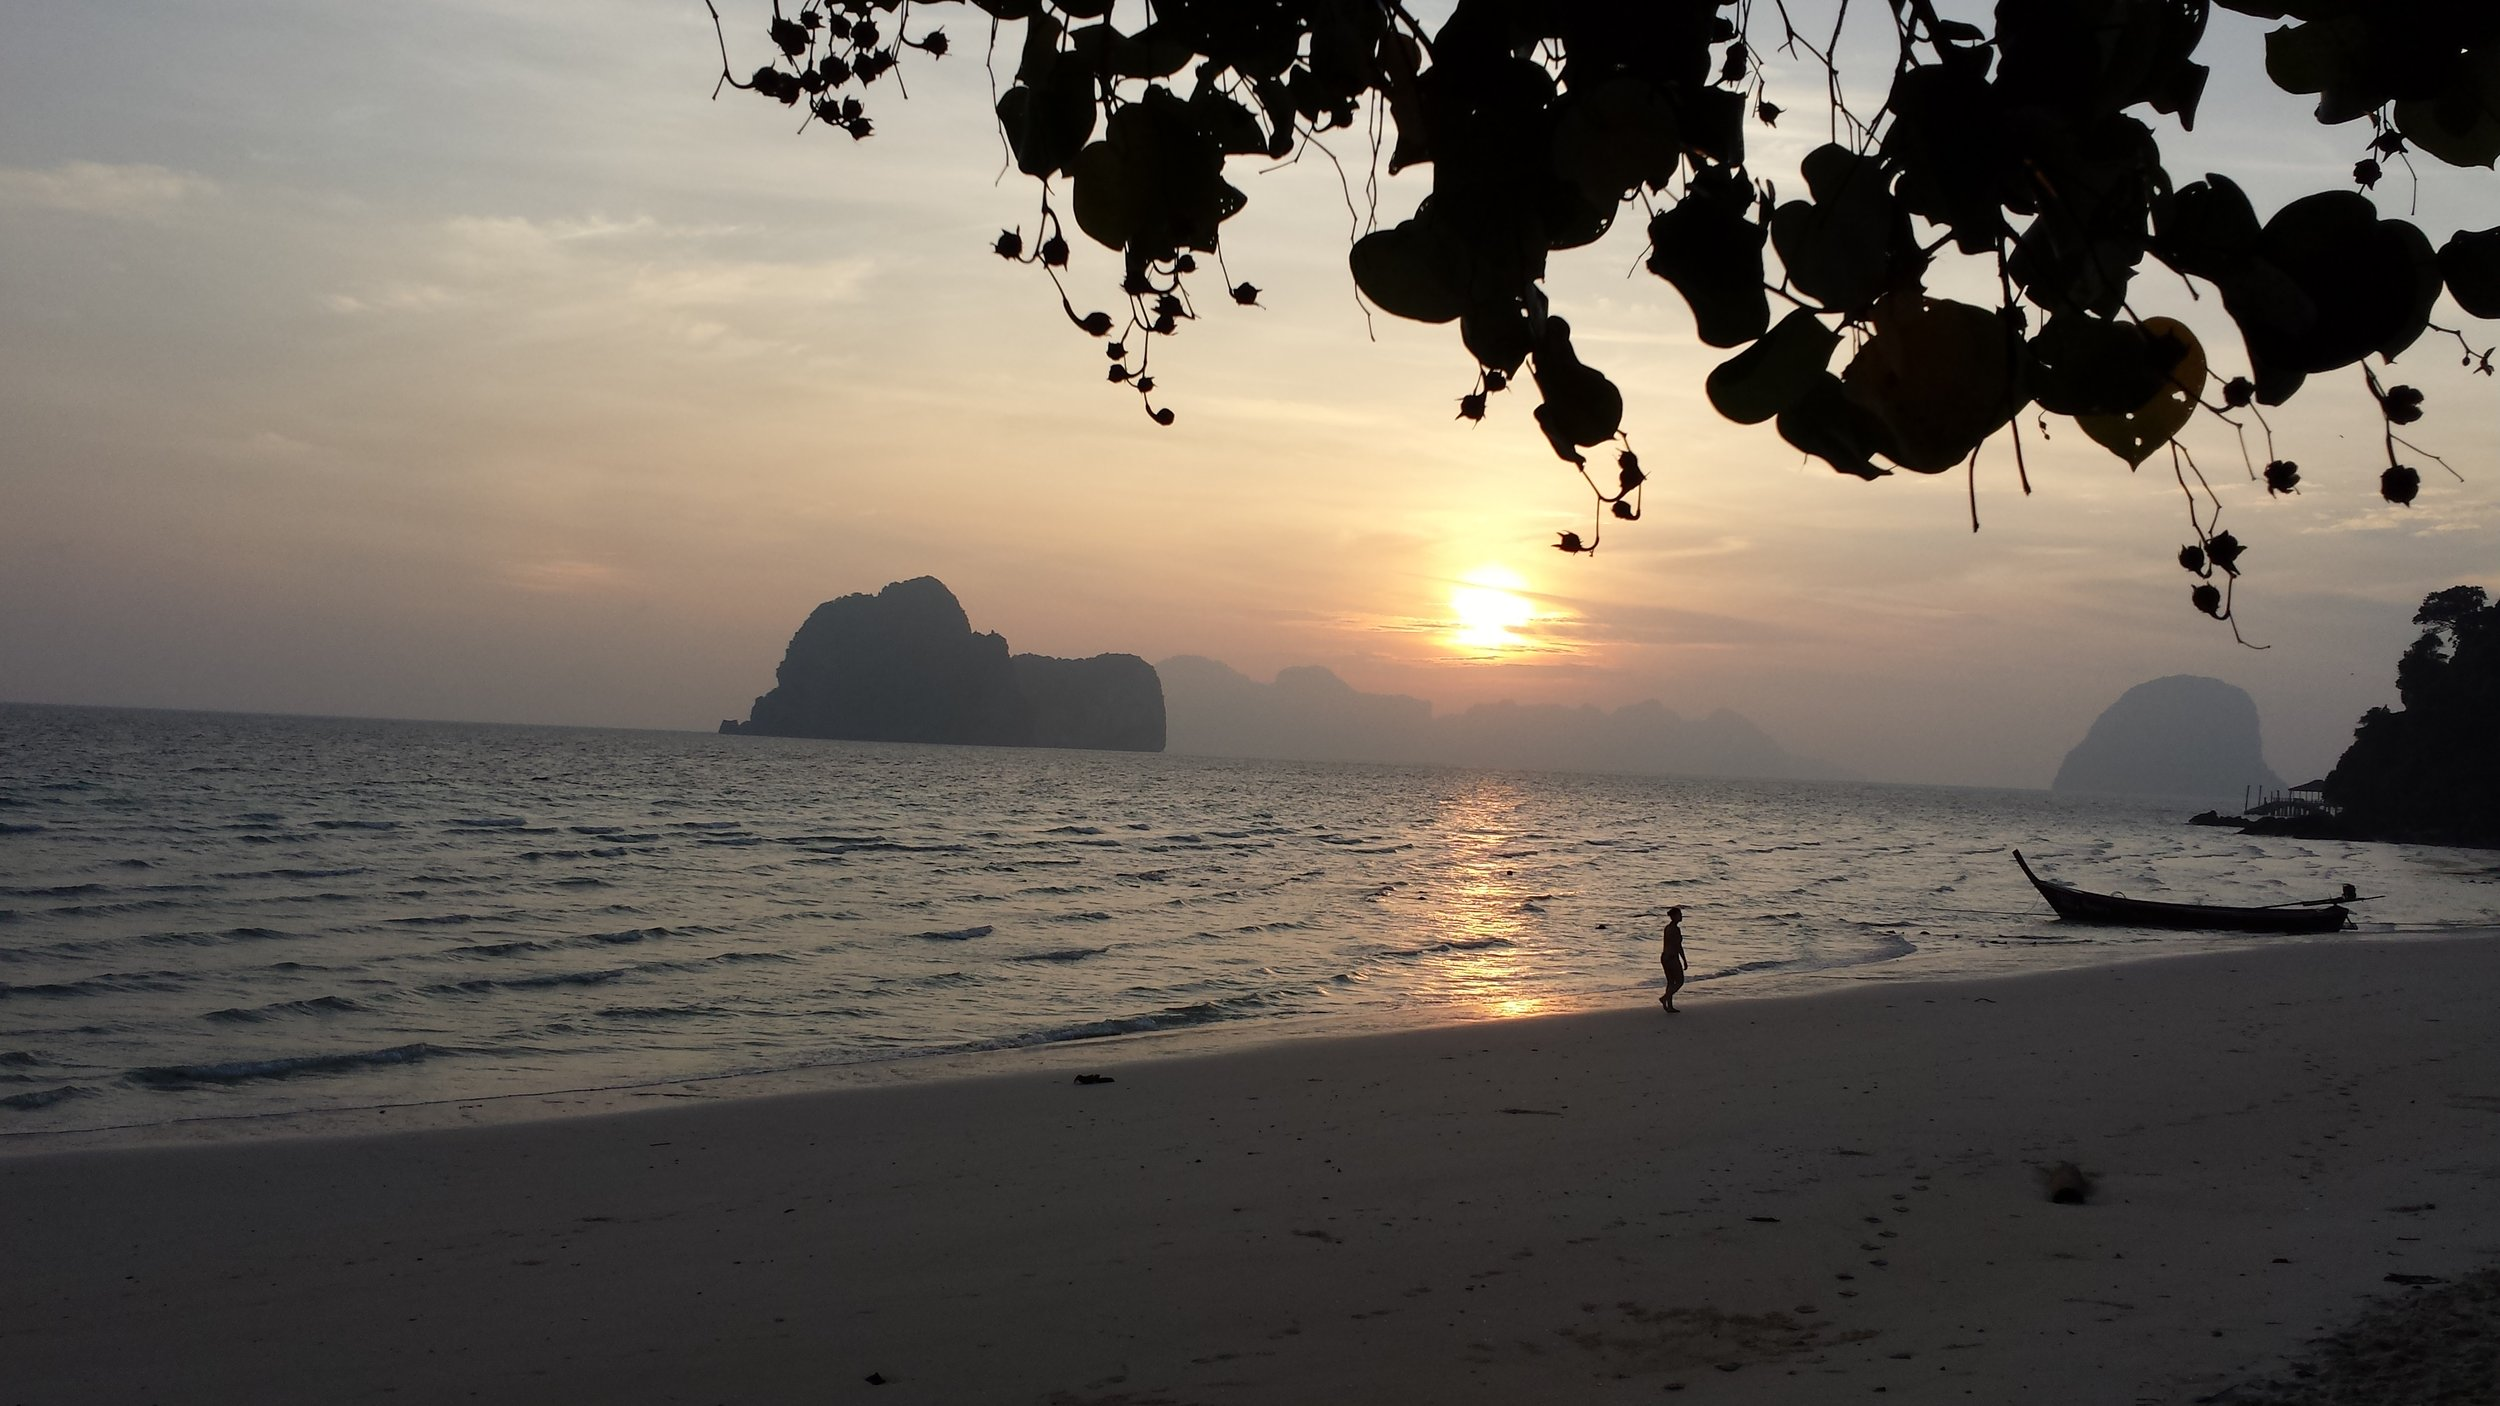 Sunrise. Thailand family vacation (2013)